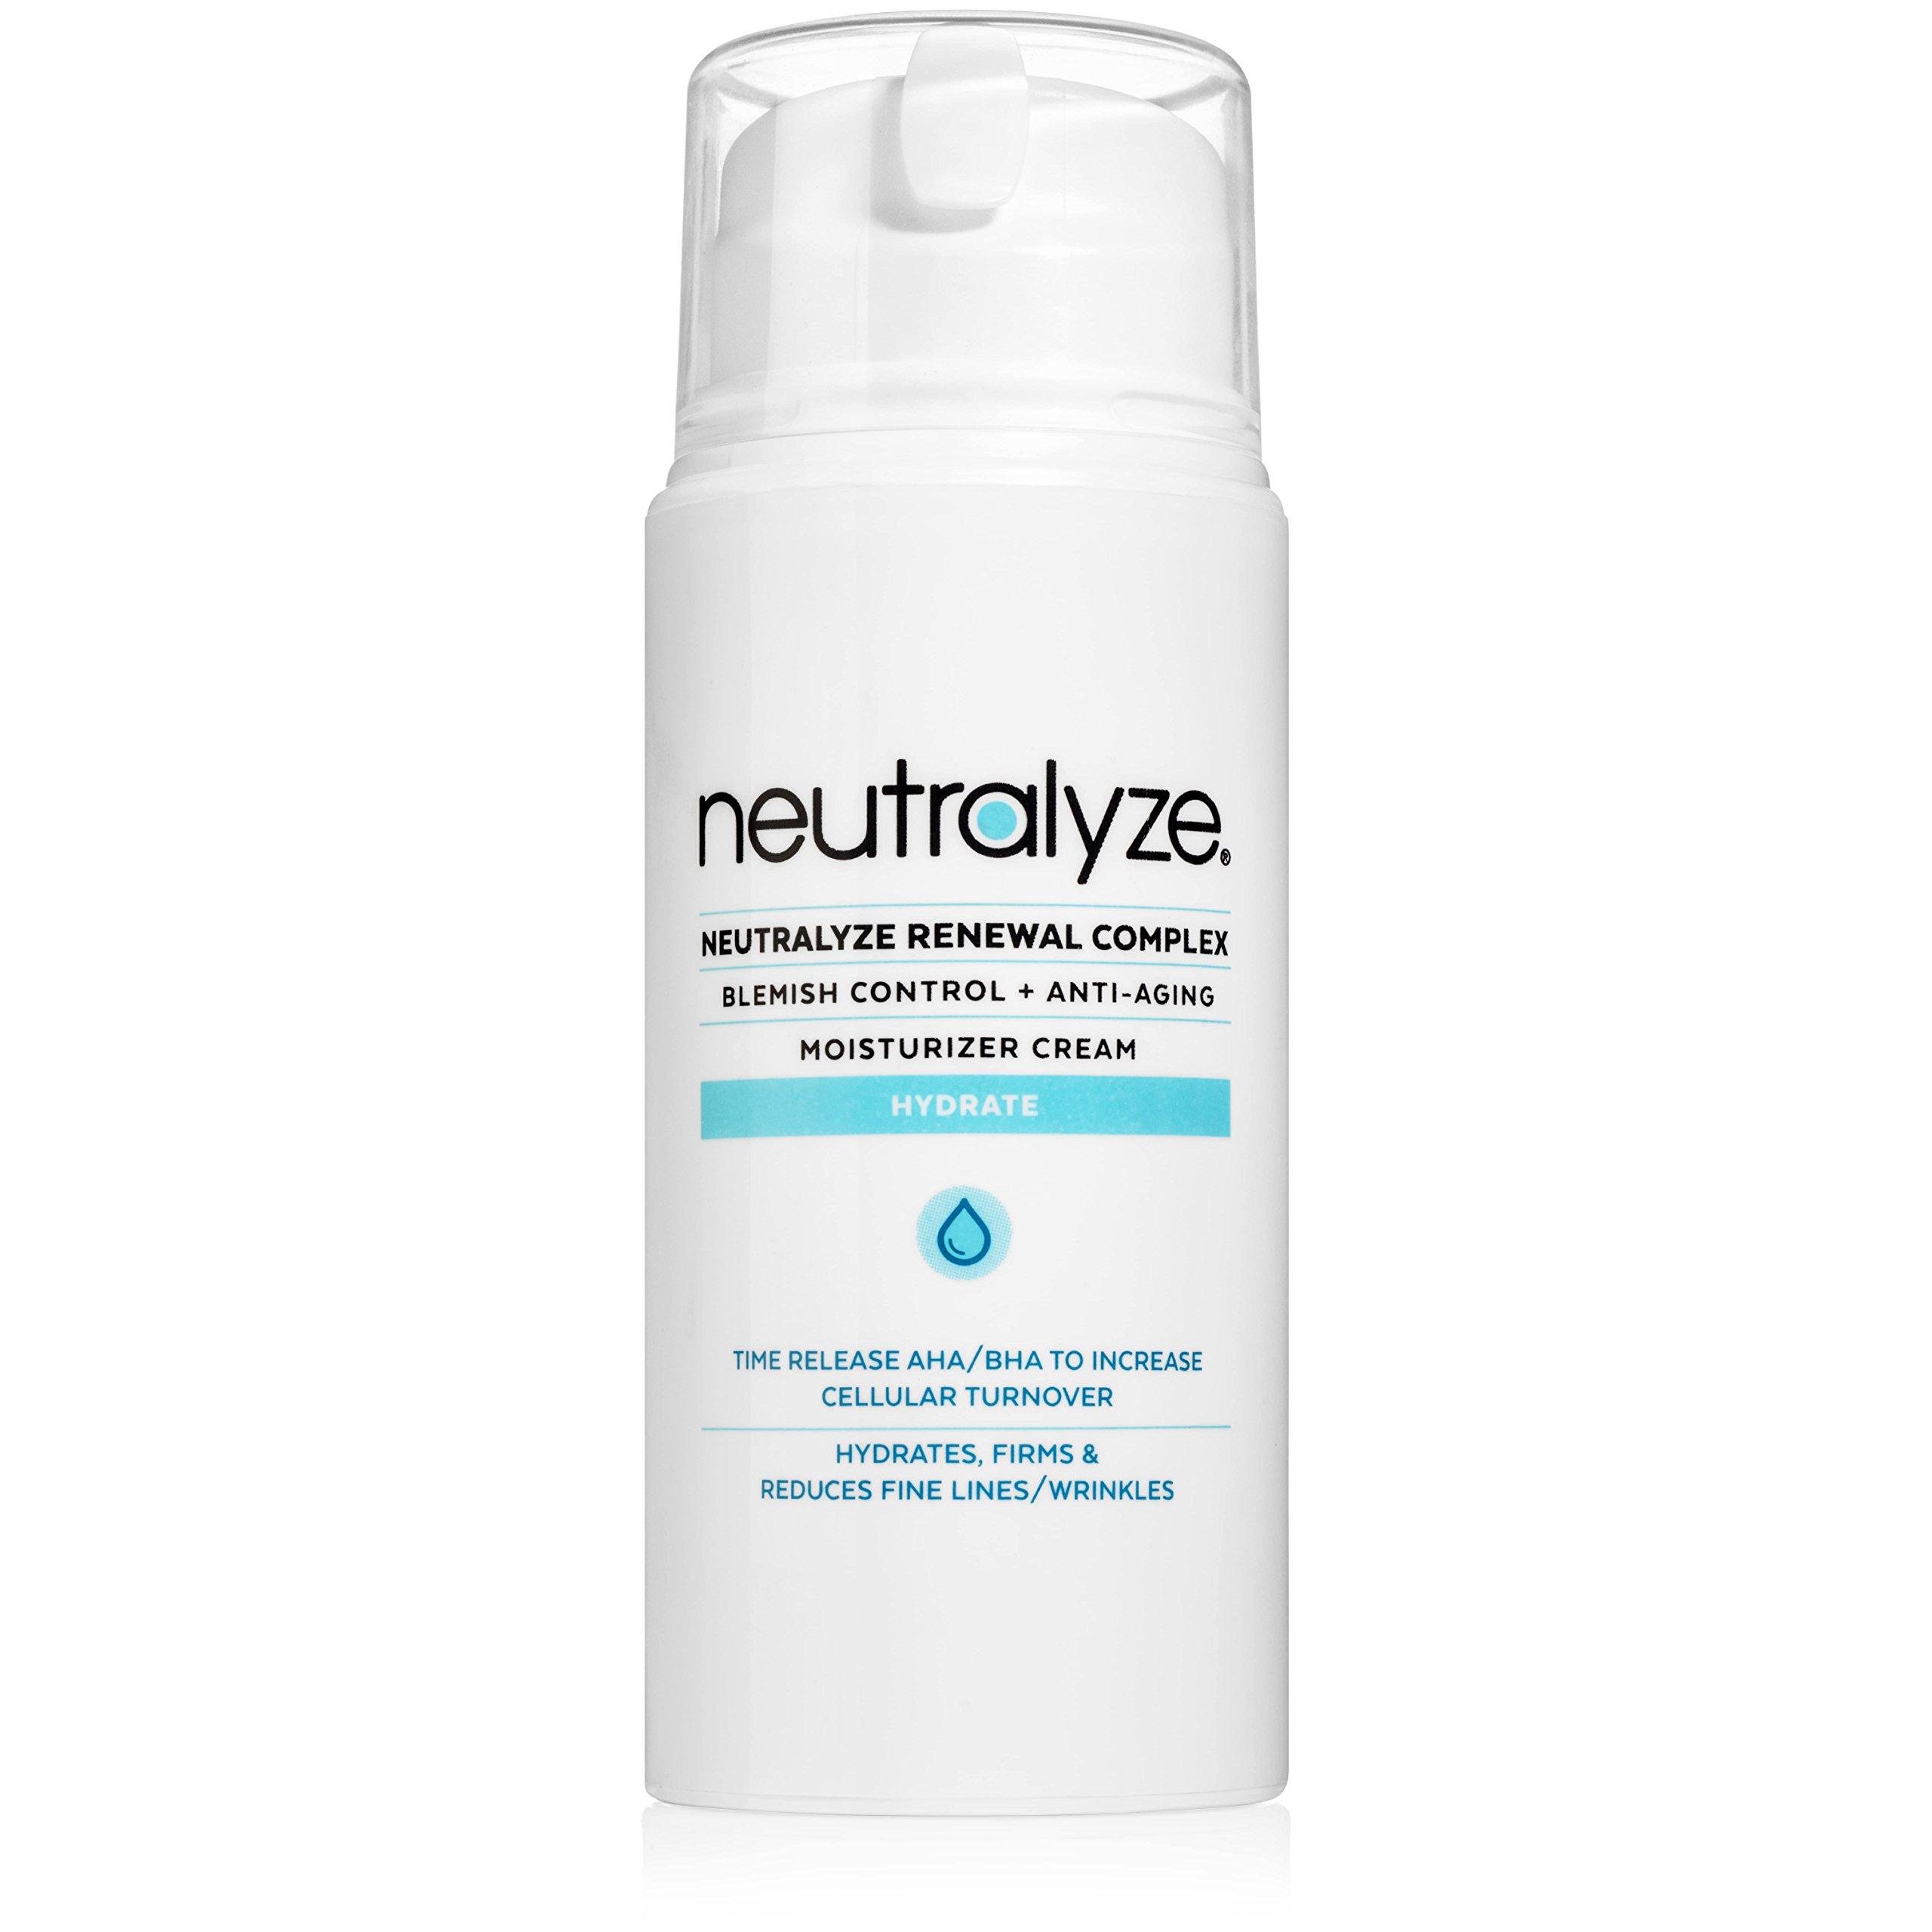 Neutralyze Renewal Complex - Maximum Strength Acne Moisturizer Cream with Time-Released 2% Salicylic Acid + 1% Mandelic Acid + Nitrogen Boost Skincare Technology (3.4 oz)